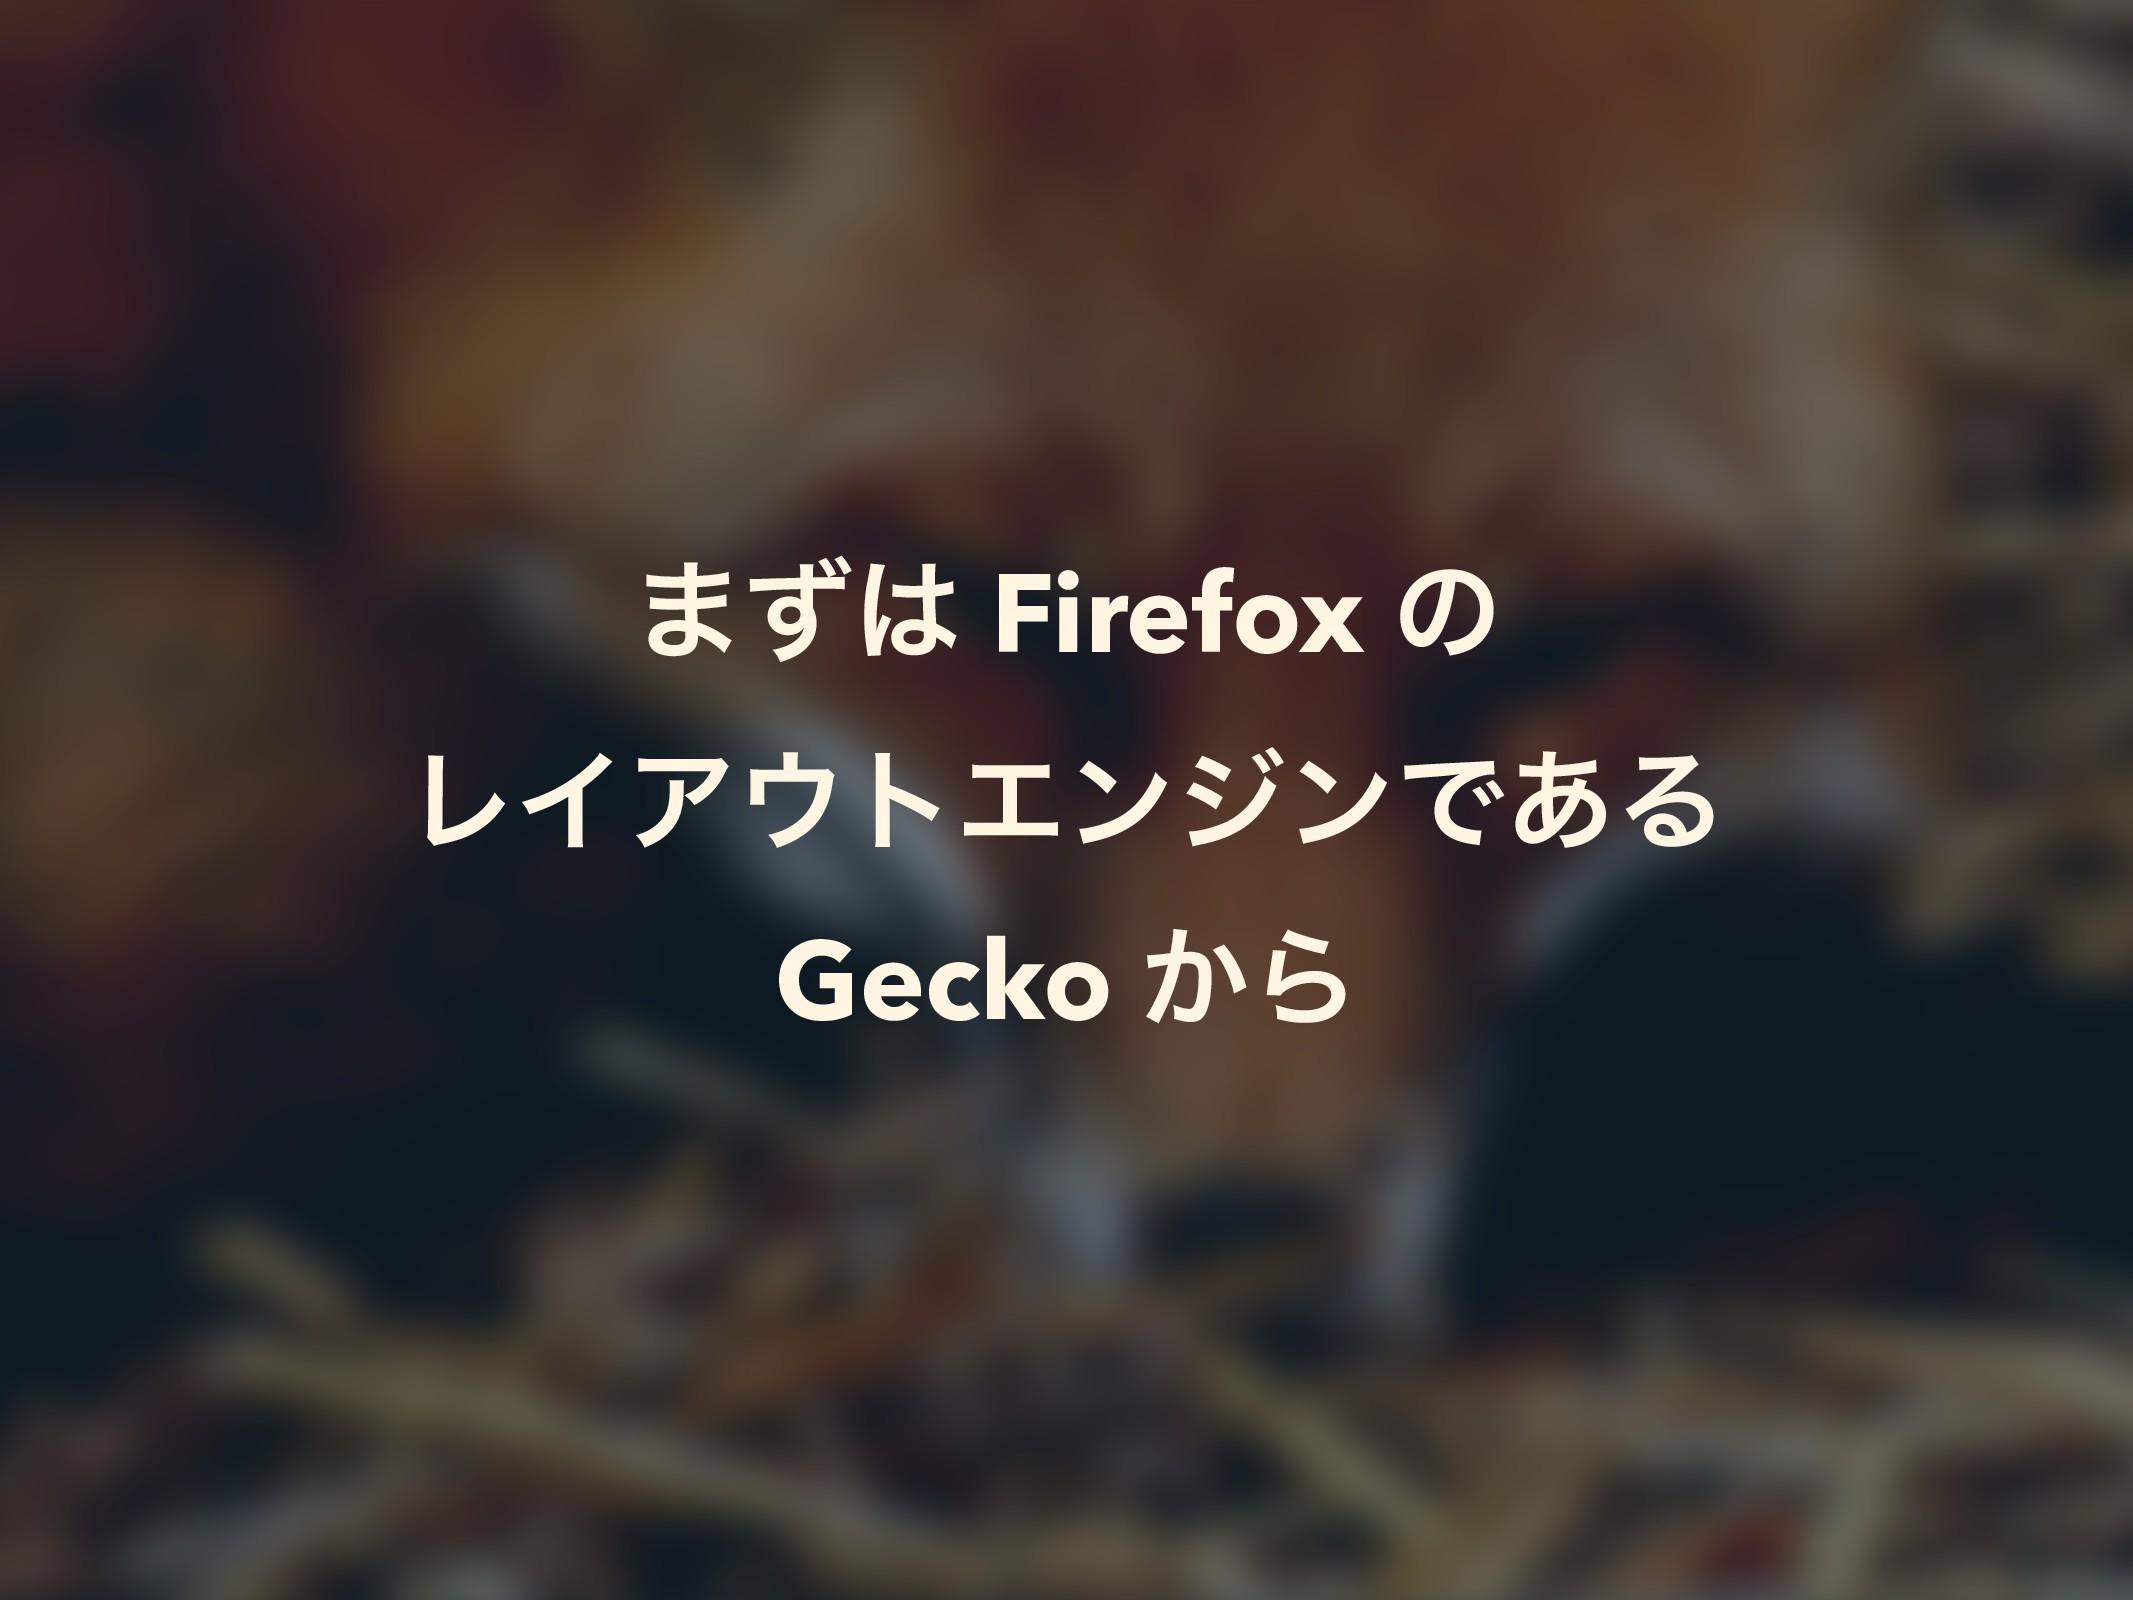 ·ͣ Firefox ͷ ϨΠΞτΤϯδϯͰ͋Δ Gecko ͔Β